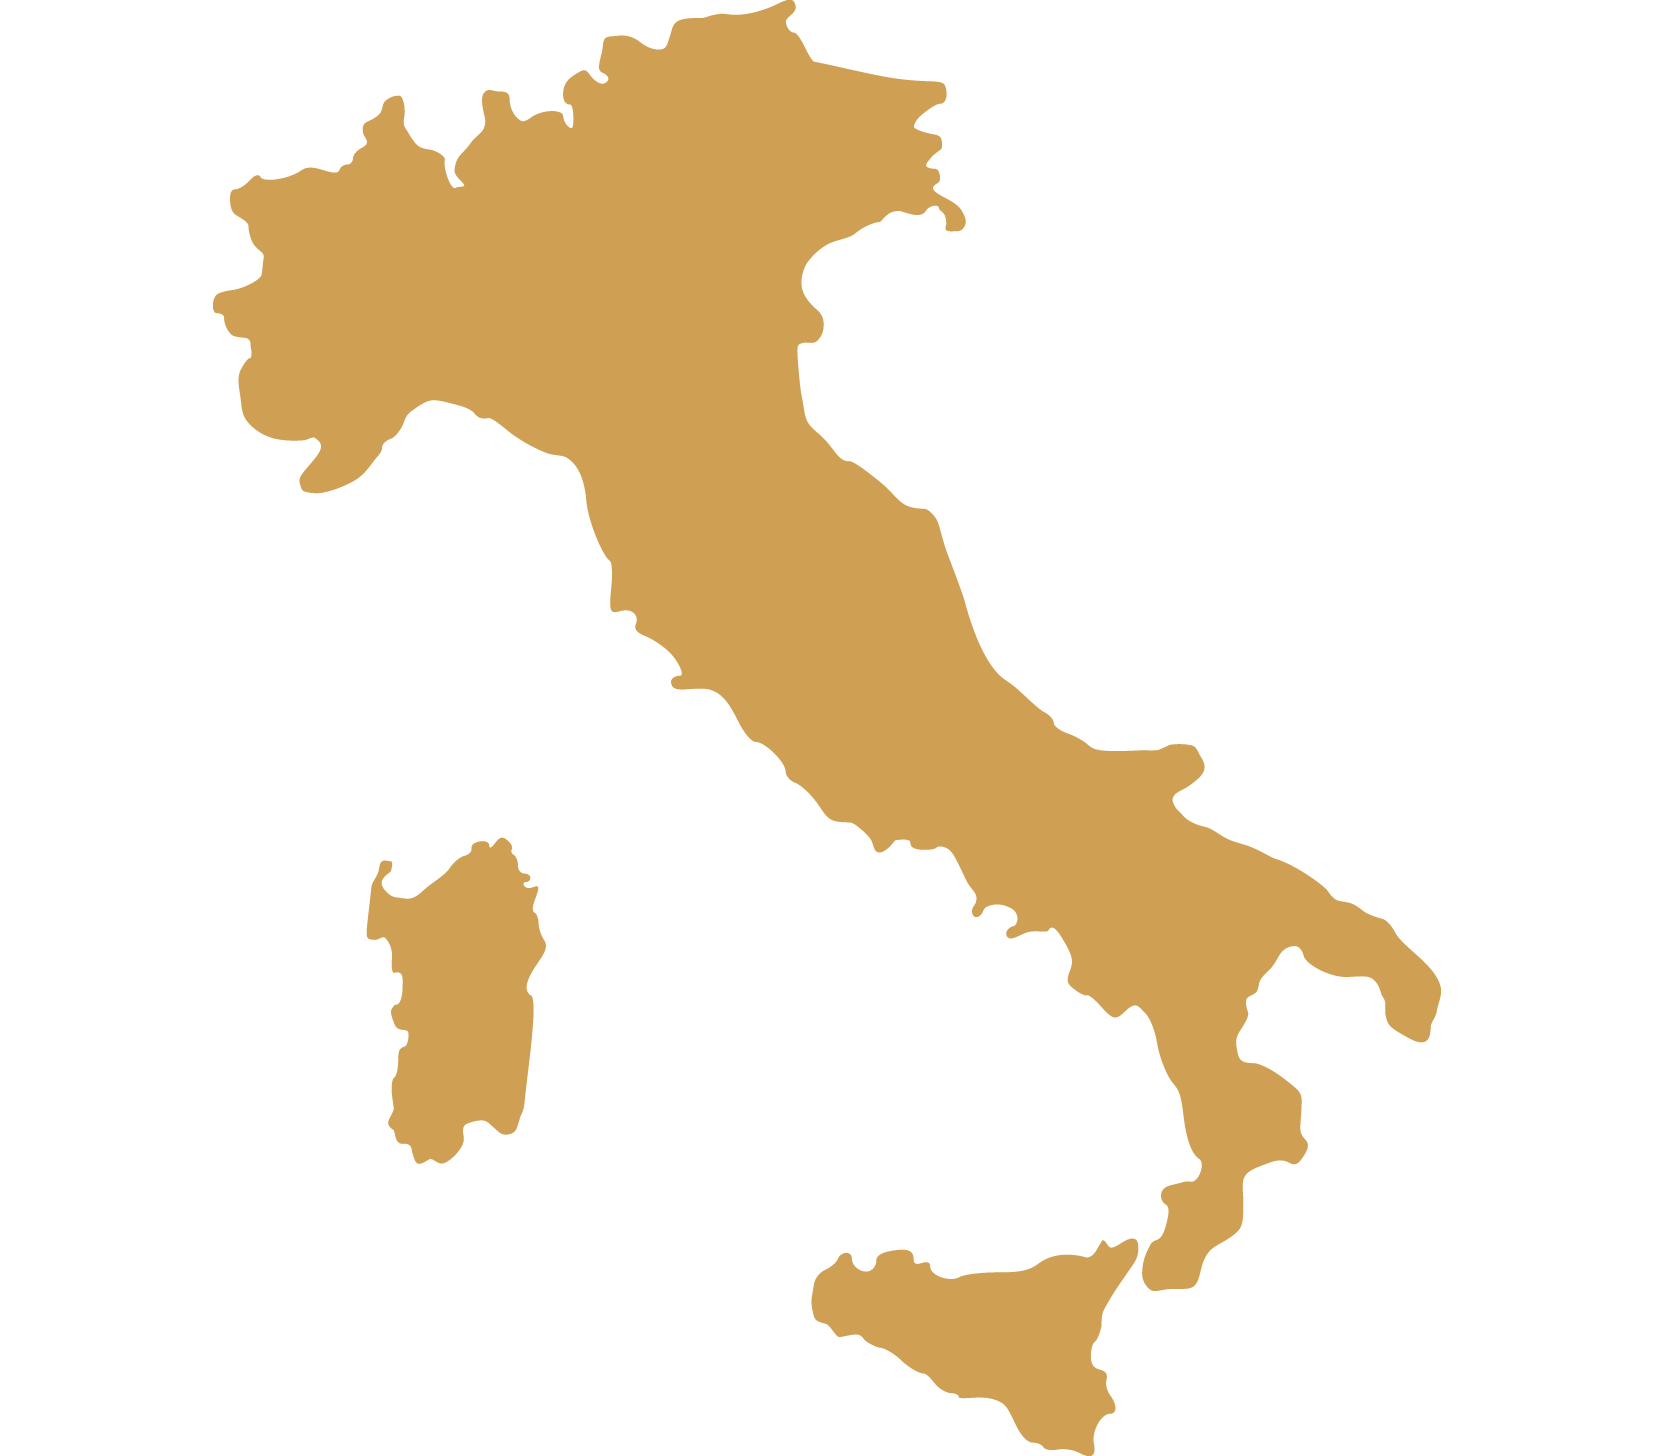 DMC Italy map